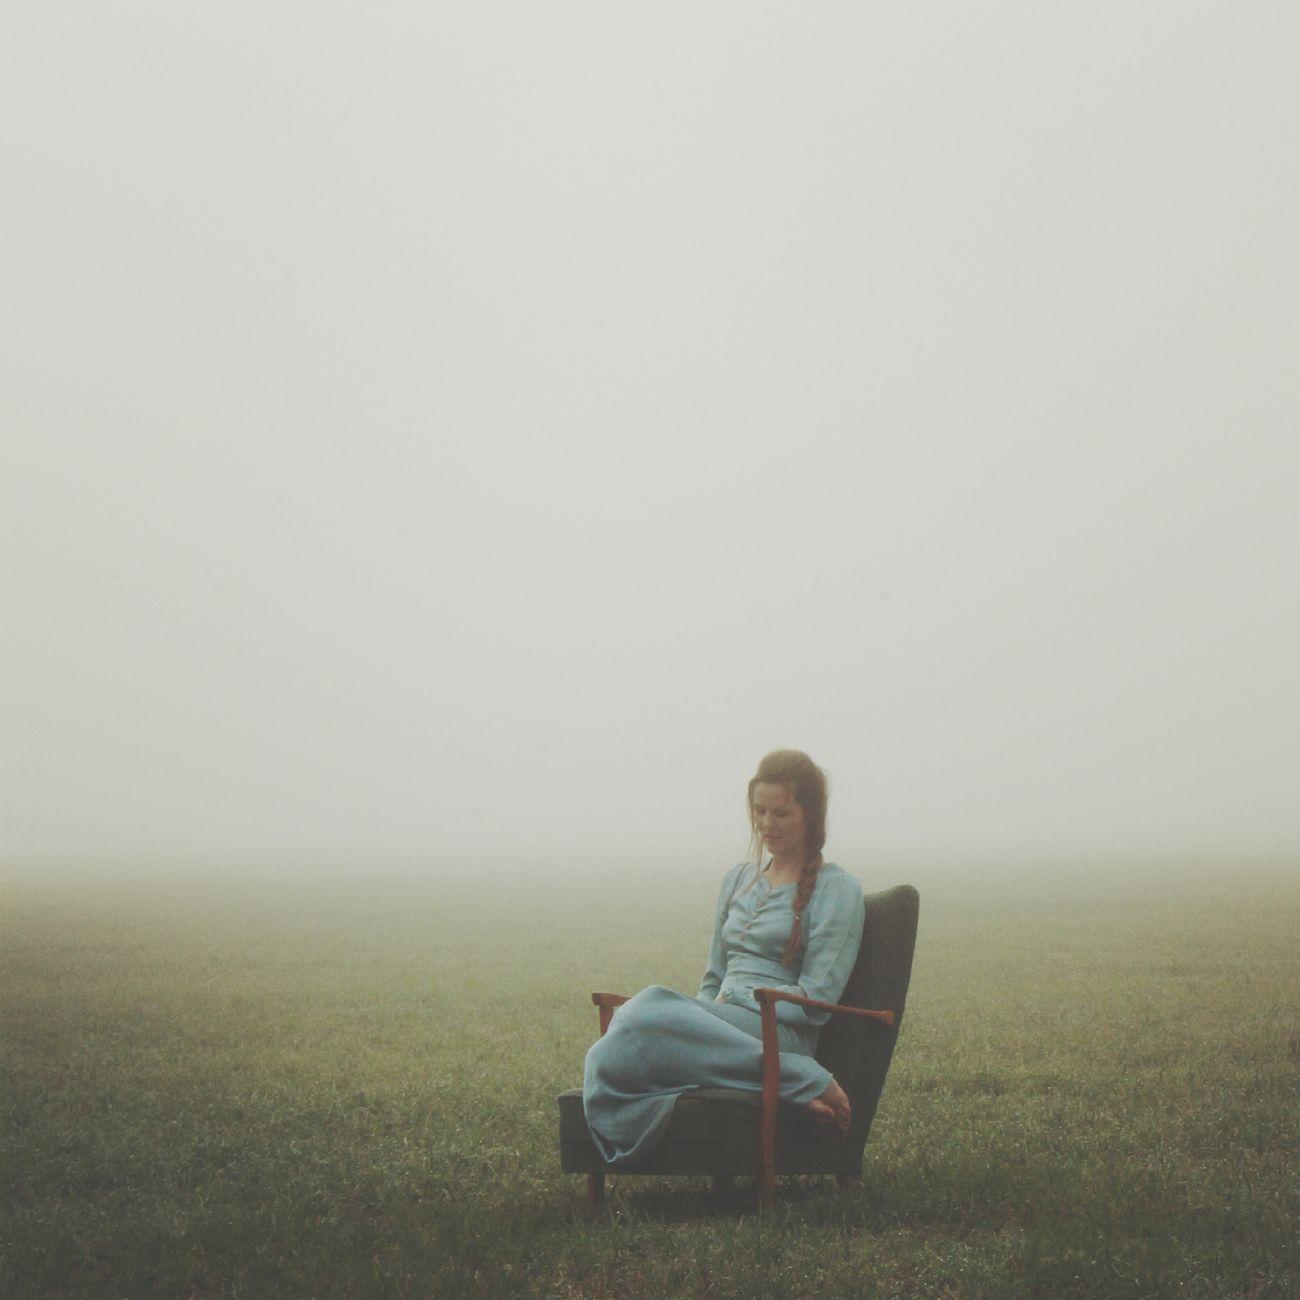 Portrait Fog Endlessness The Portraitist - 2015 EyeEm Awards